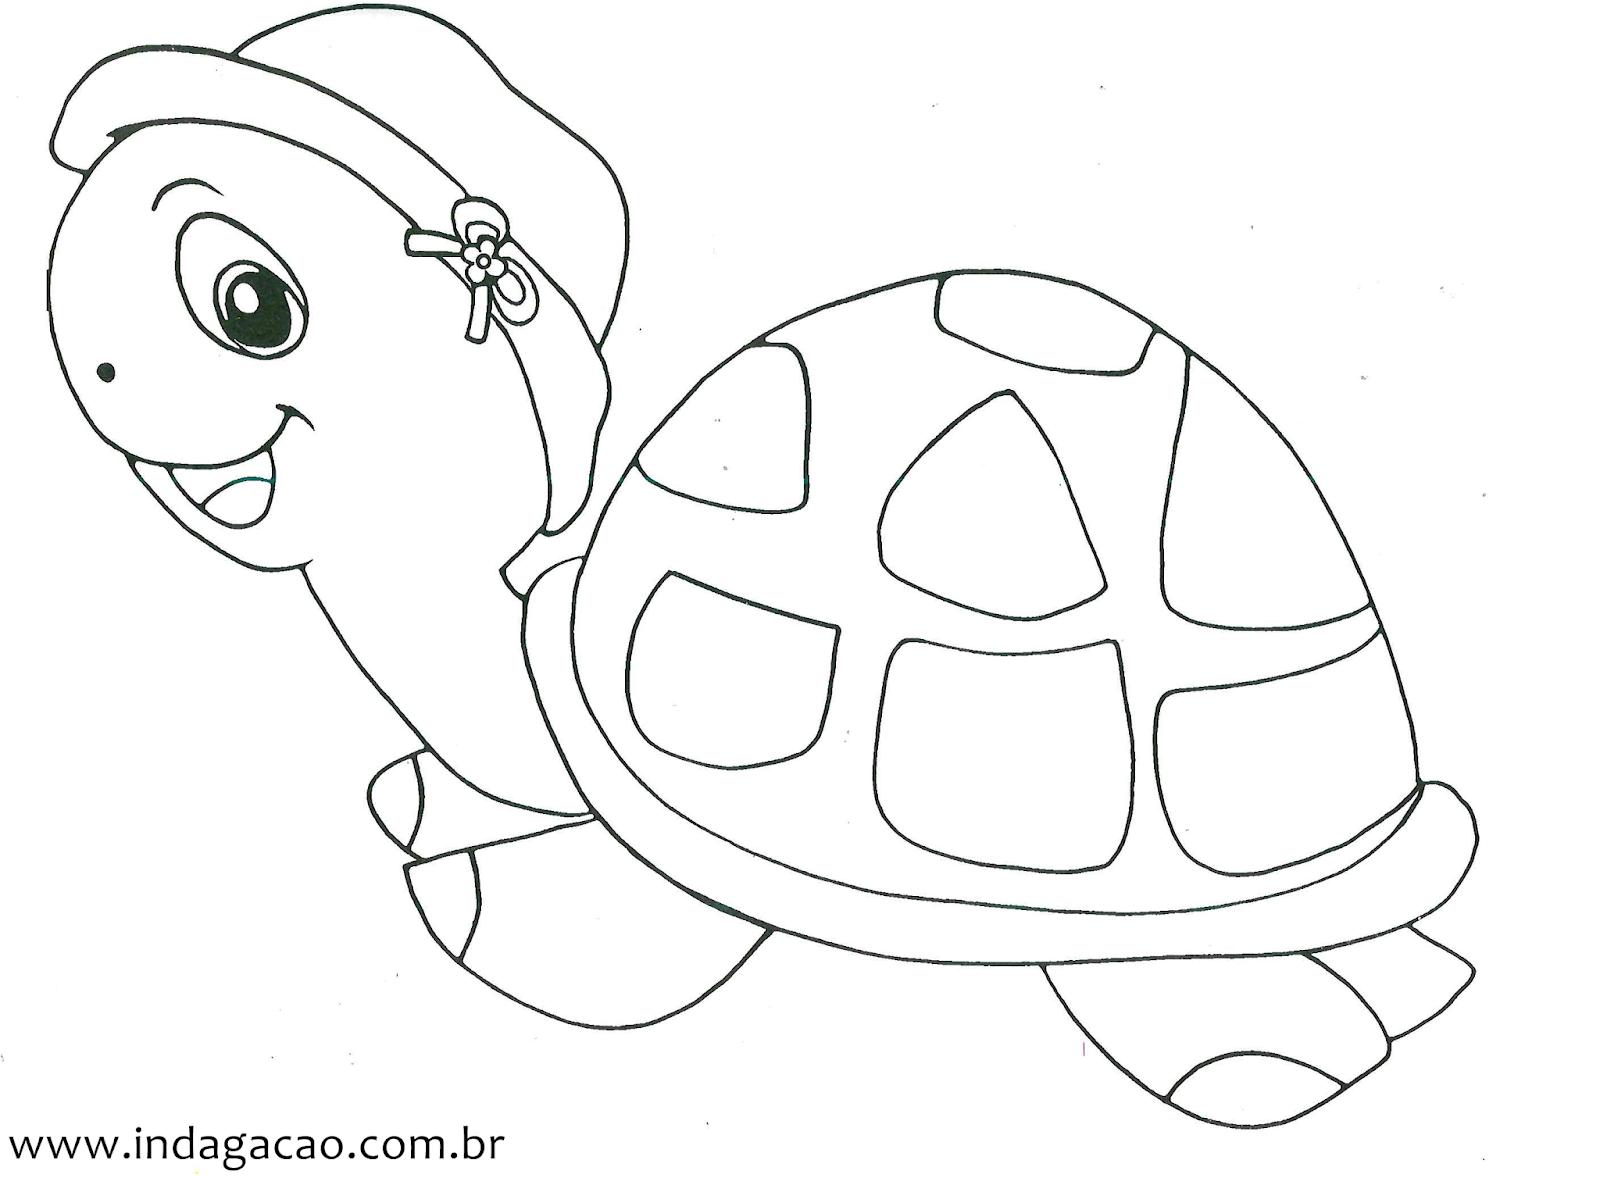 Desenho De Tartaruga Para Colorir Indagacao